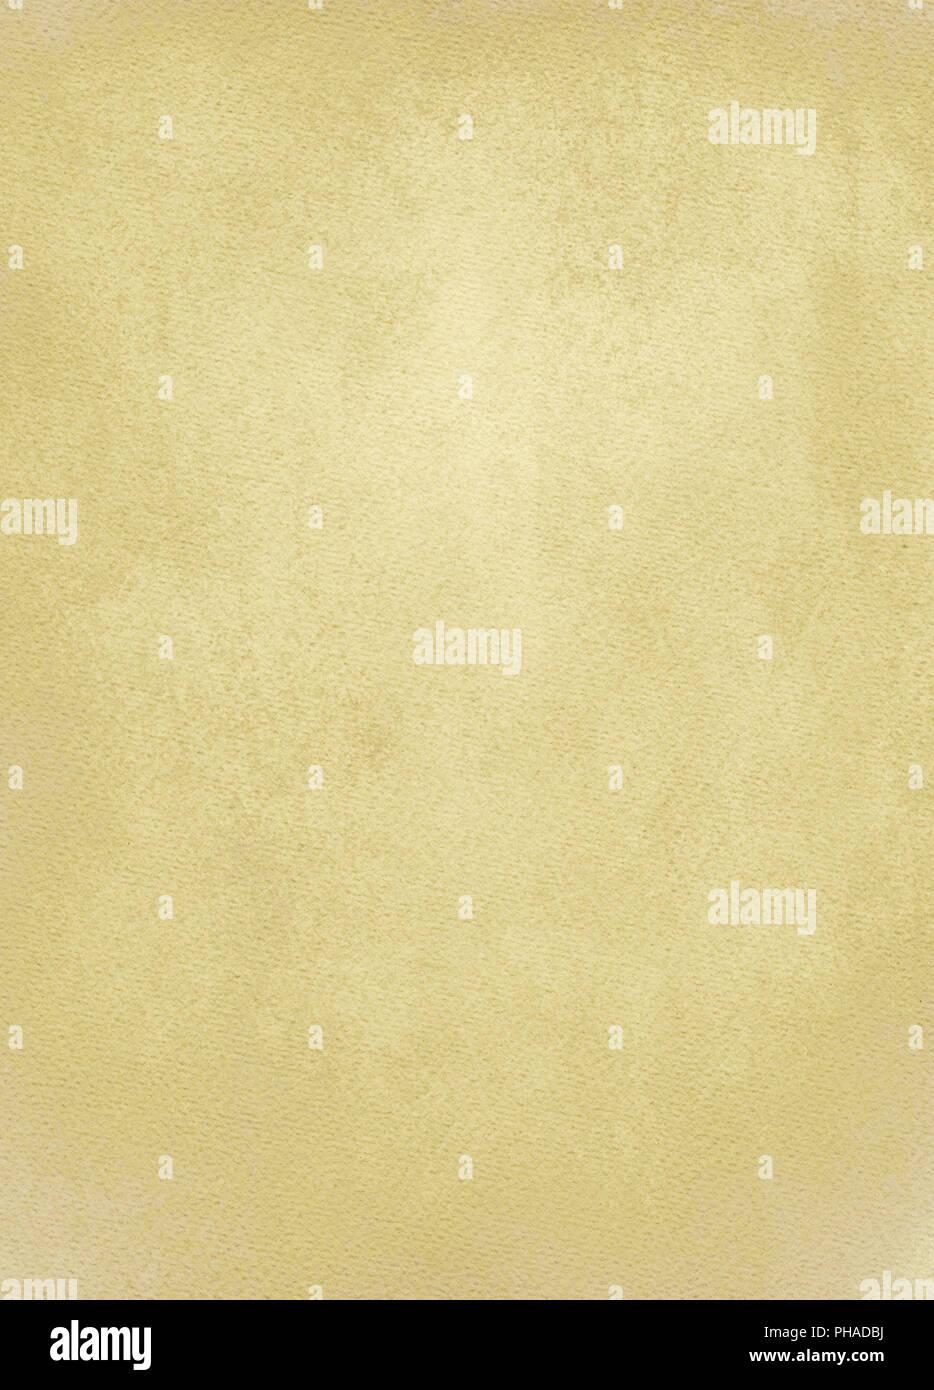 Texturas de fondo de papel viejo Imagen De Stock